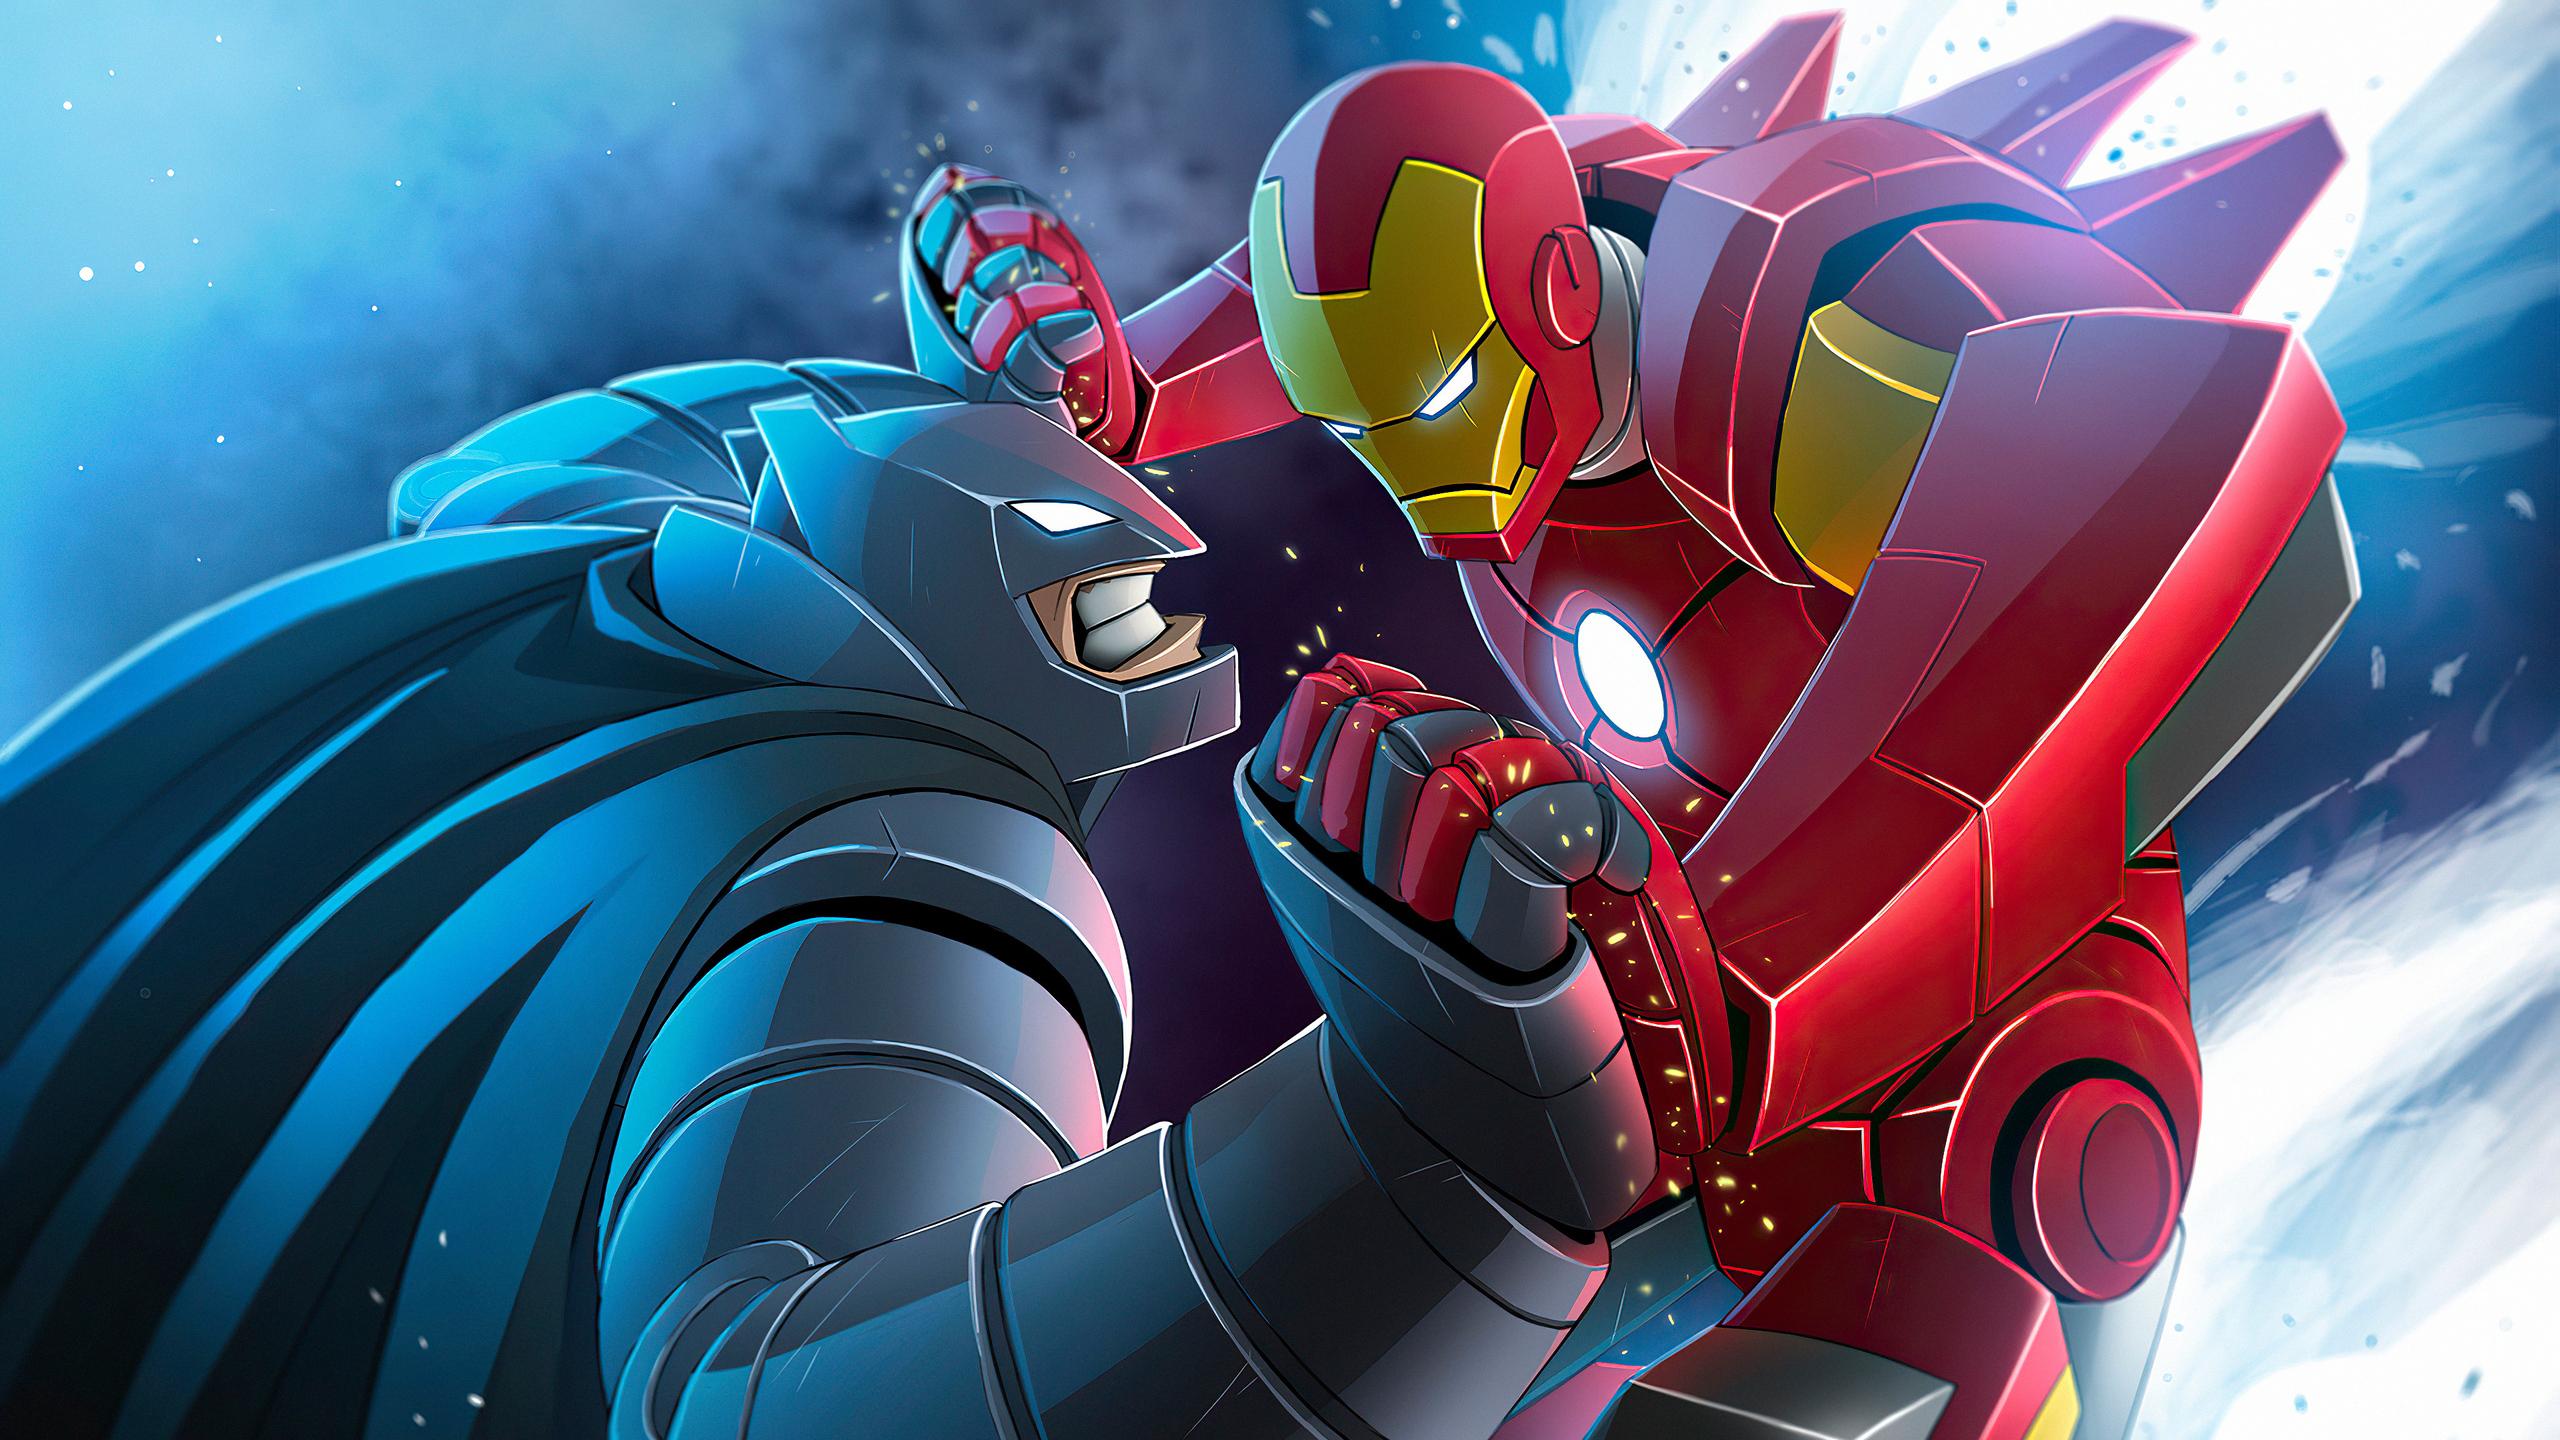 bat-man-and-iron-man-bv.jpg